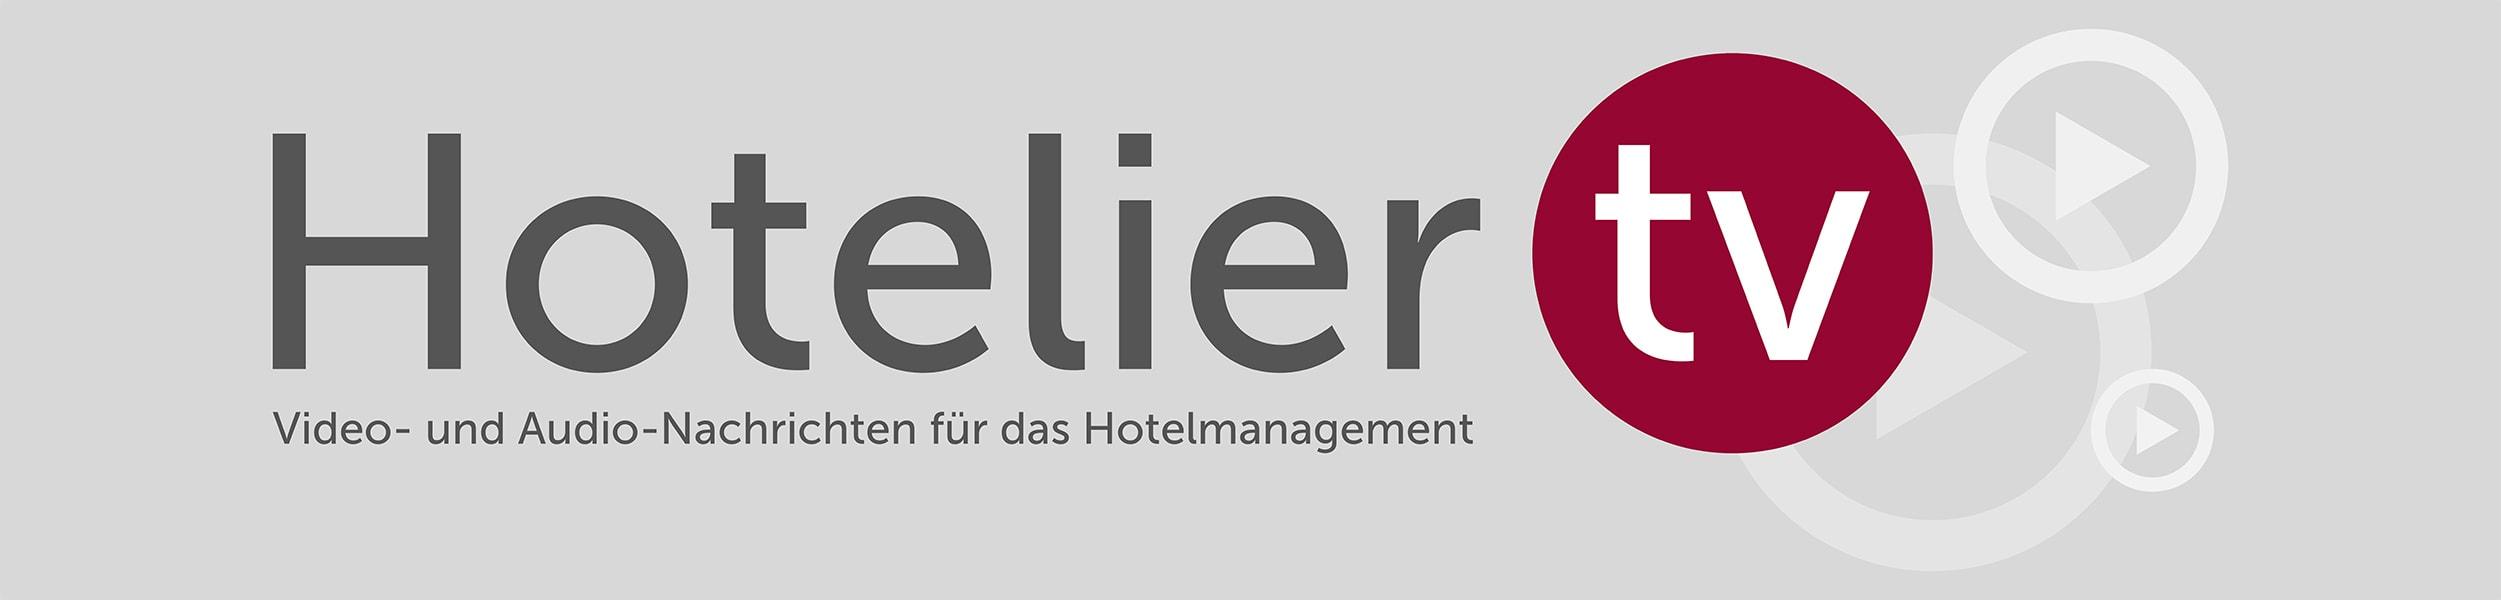 hotelierTV-logo-large